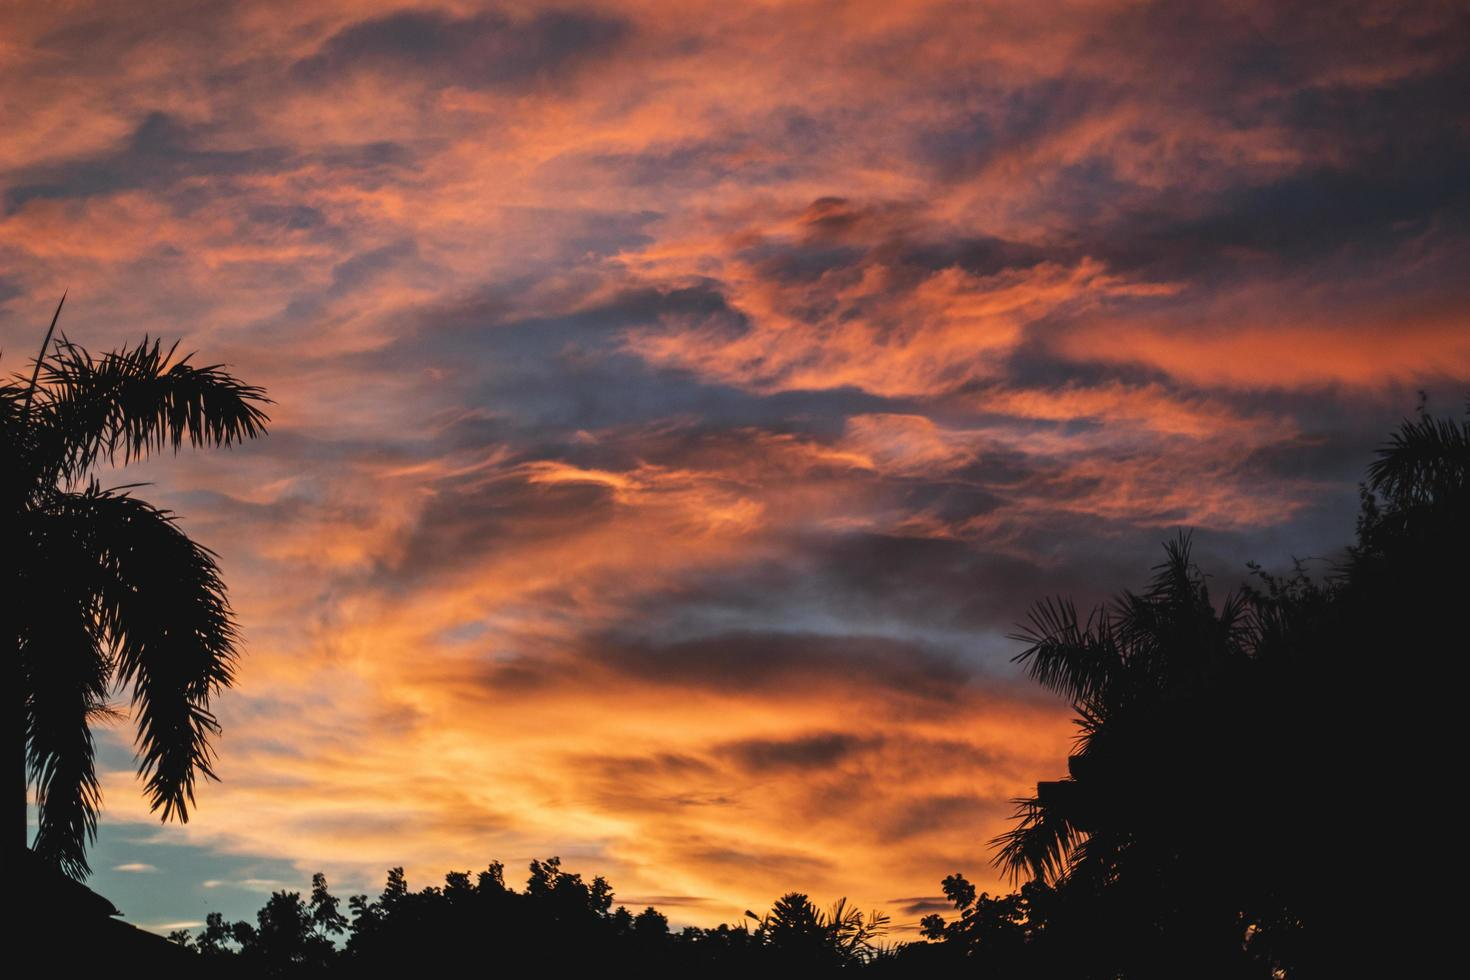 Sonnenuntergang über Palmen foto